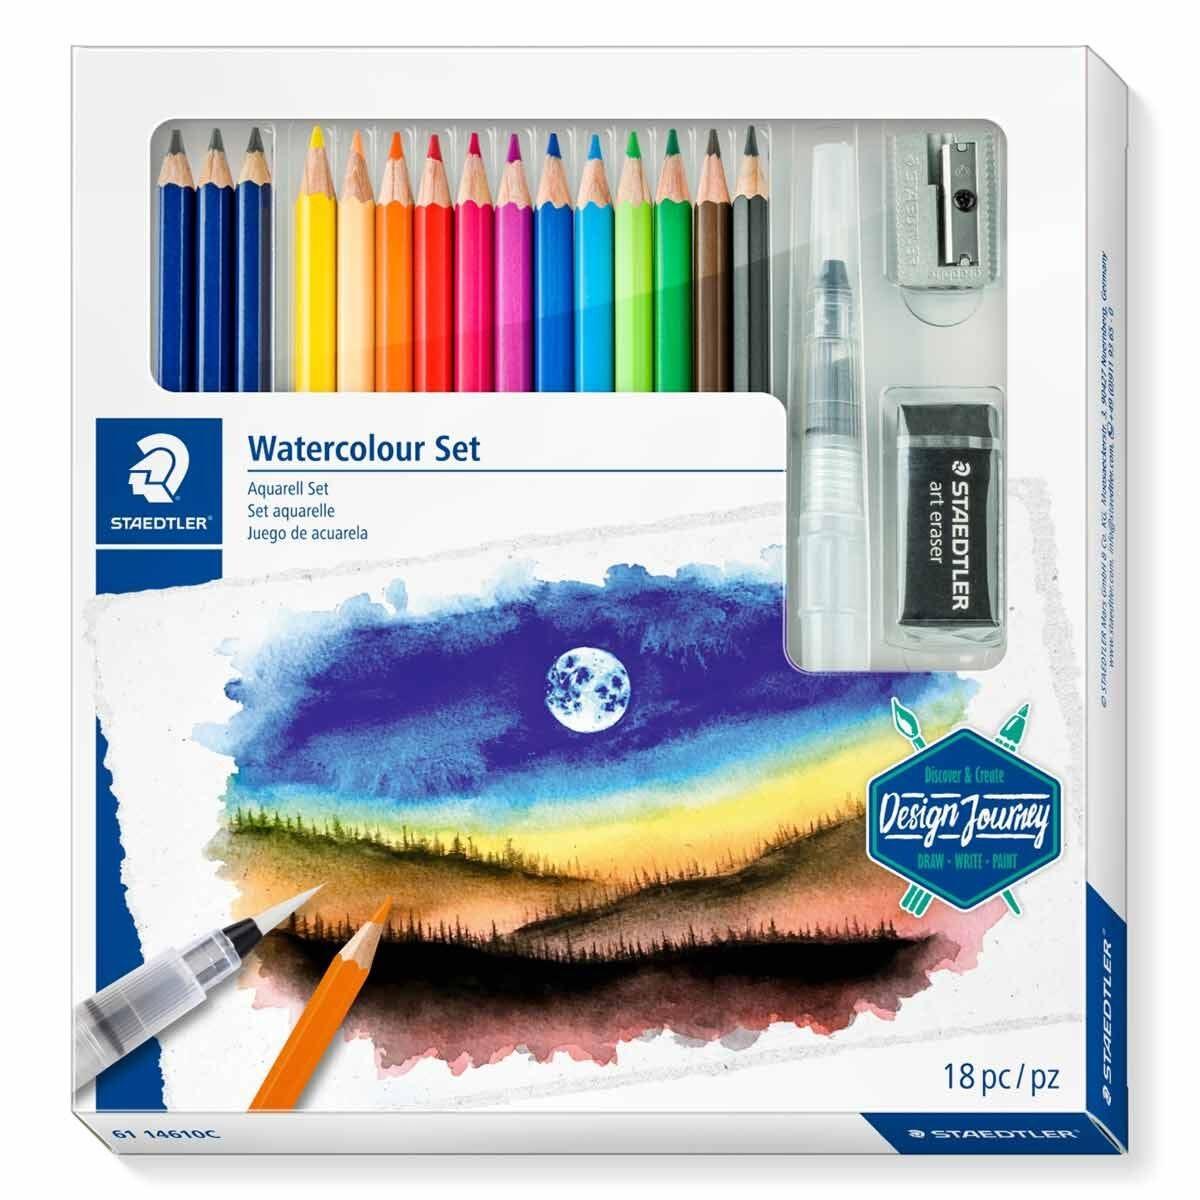 Staedtler Design Journey Watercolour Set